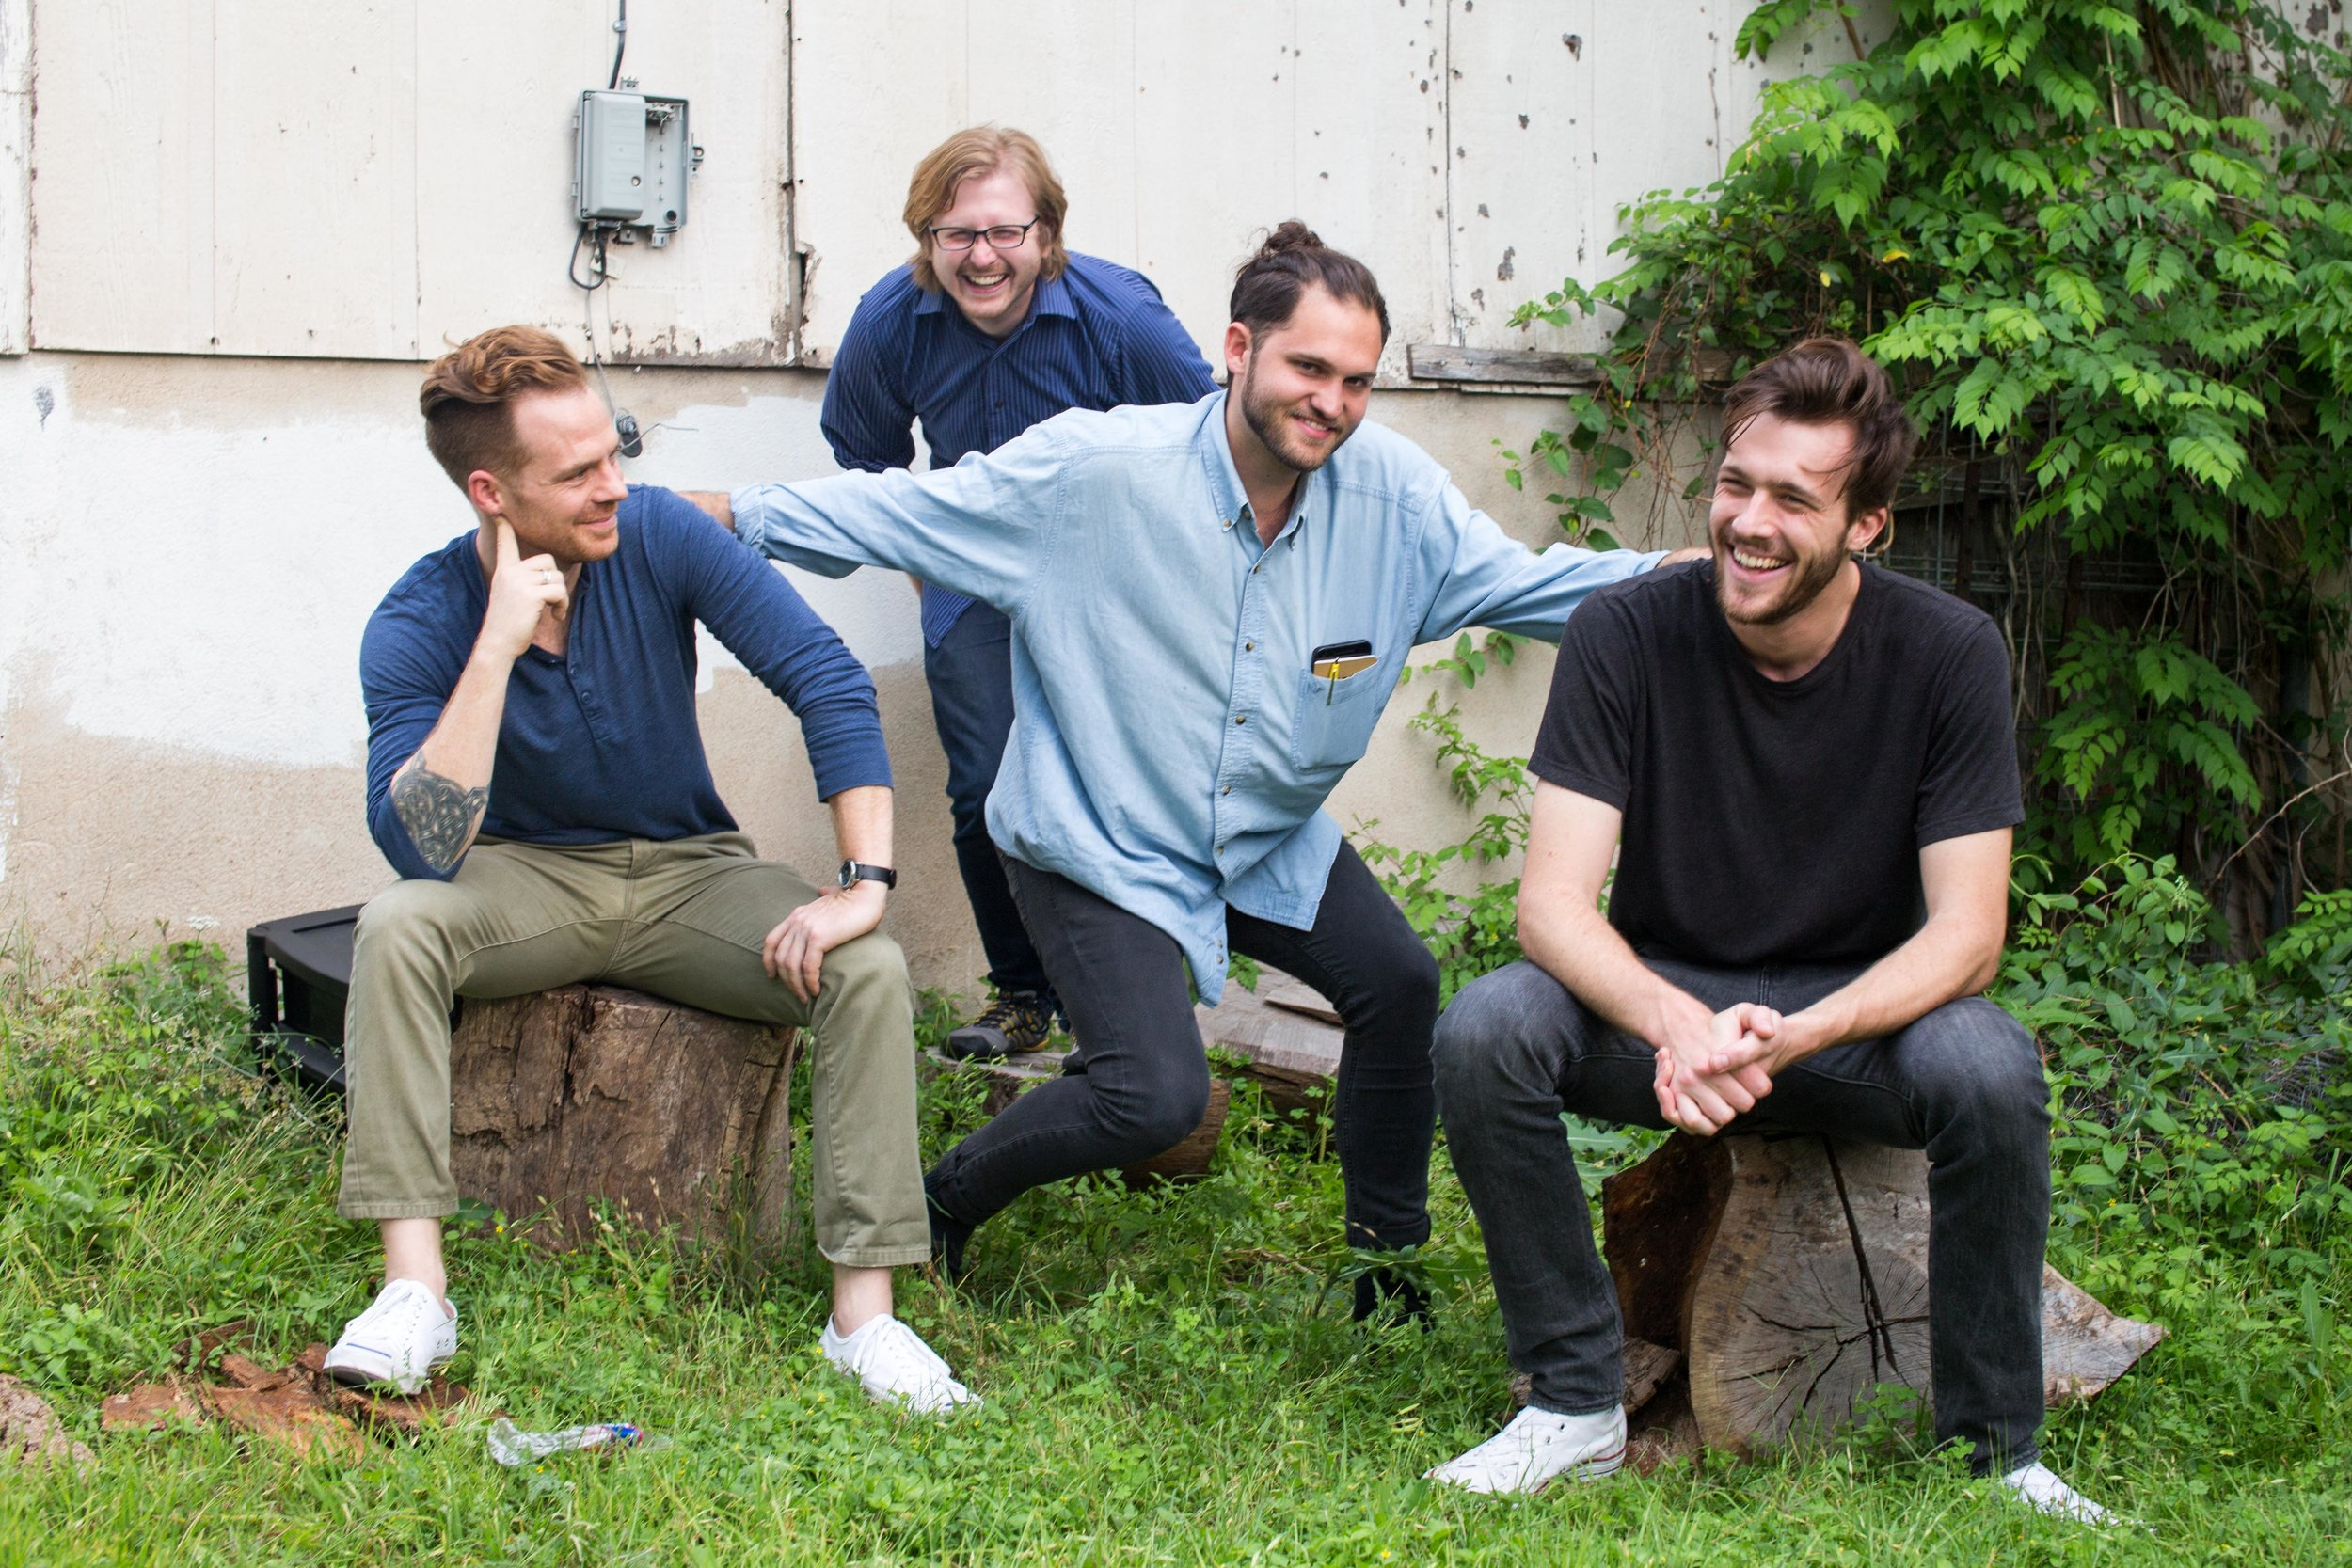 From left to right: Adam Carnes (Adam1), Kevin Reilly, Adam Zeiner (Adam2), BJ Thomas  javi gonzalez/collective blue